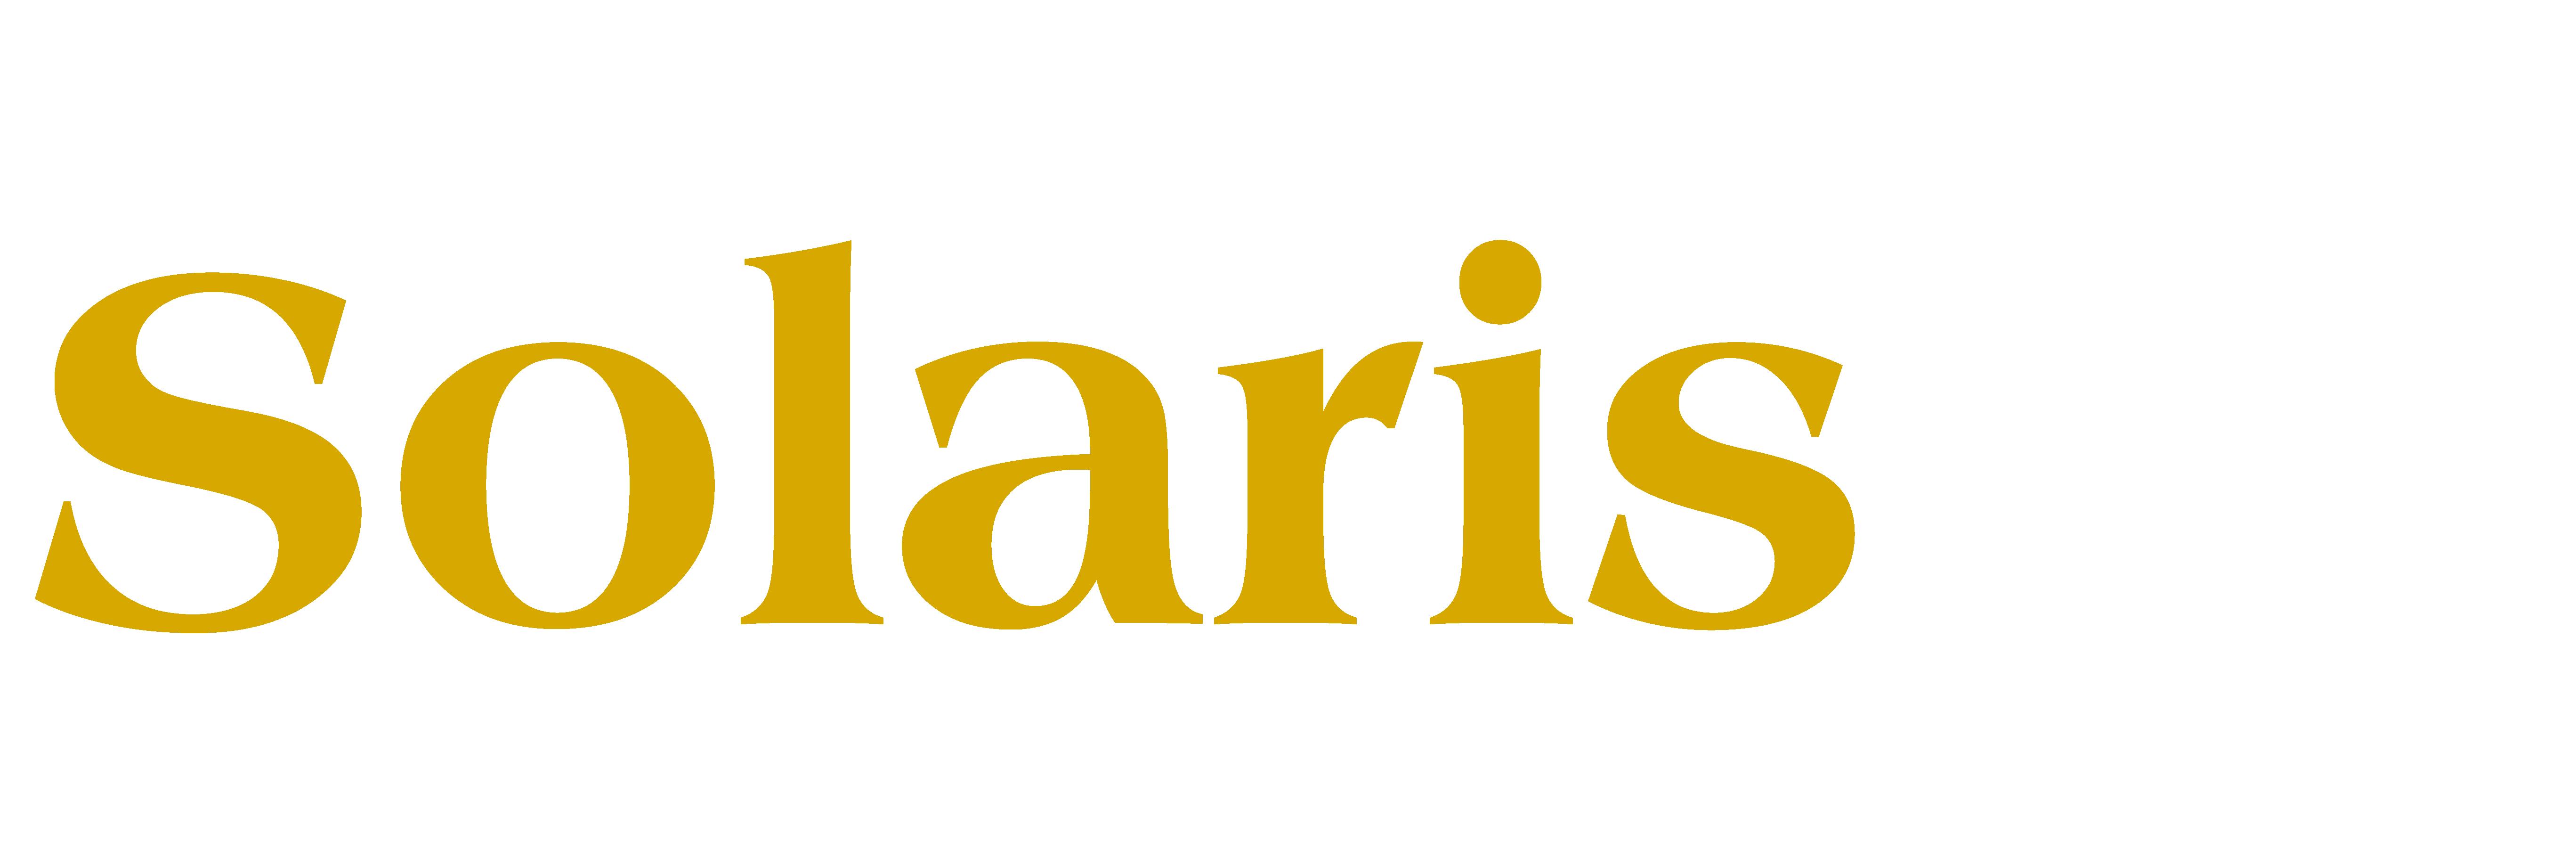 Solaris_Equestrian_Logo_White